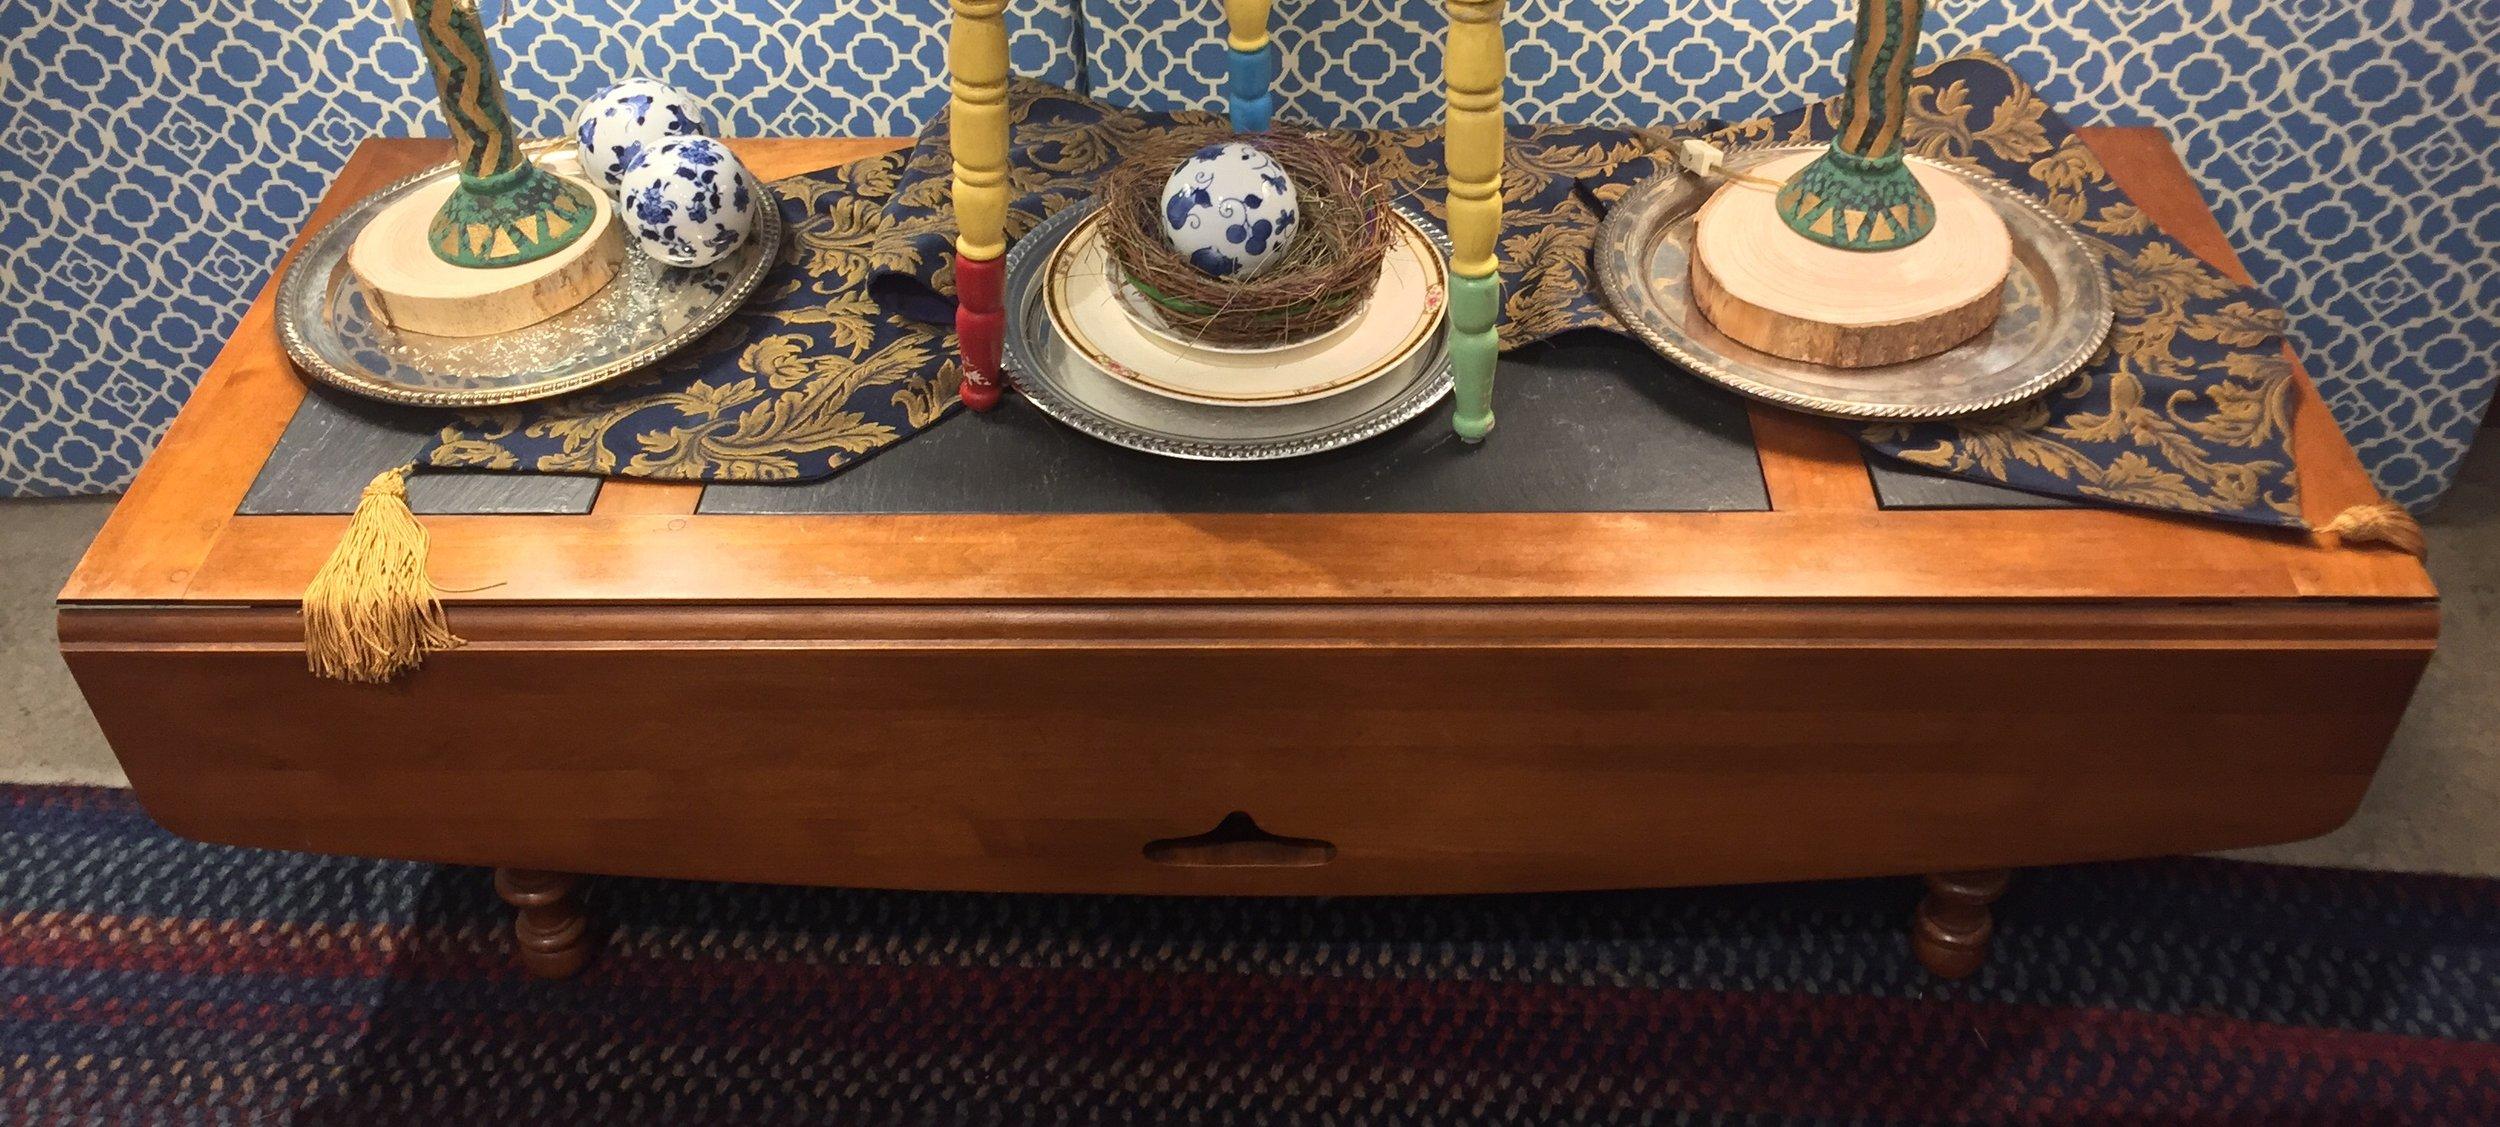 Drop Leaf Slate Top Coffee Table $119.95 - C1043 22809